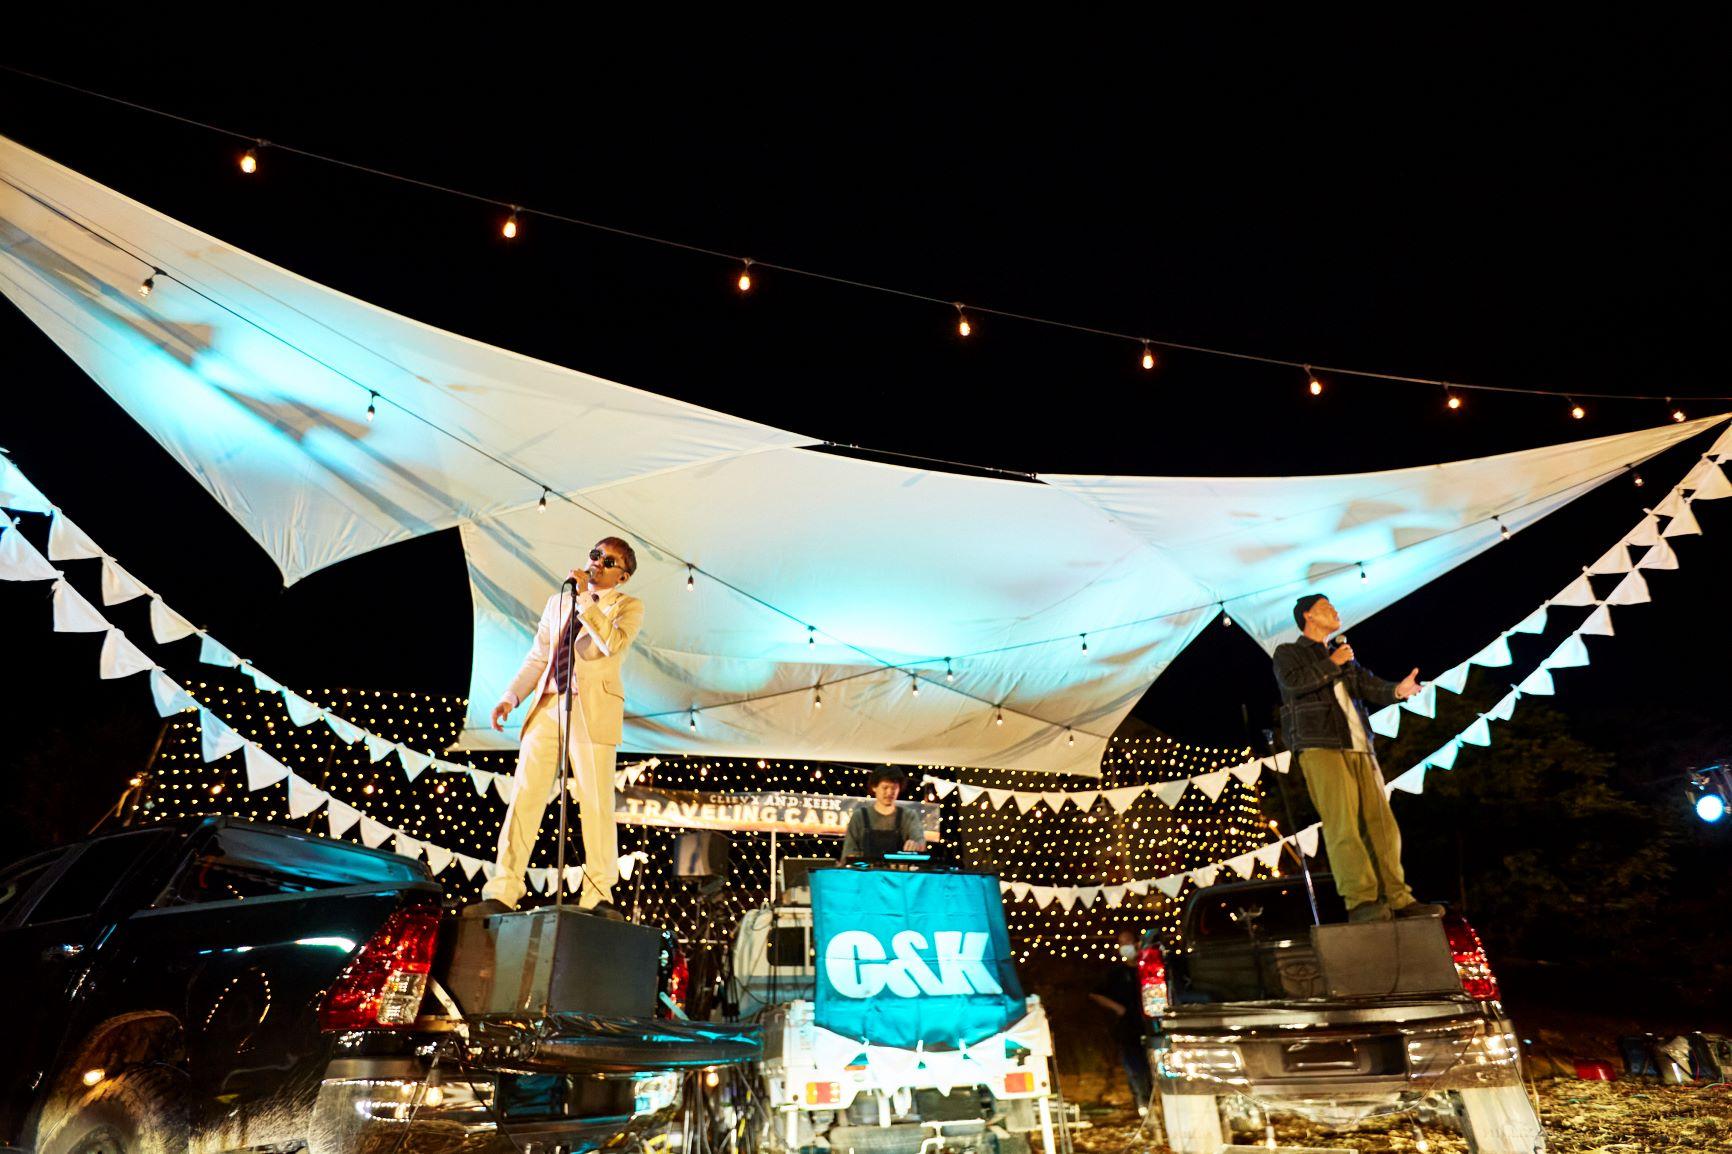 "C&K メジャーアーティスト初の試み、約4か月振りとなる生ライブ実現! ""ドライブインライブ""大盛況のうち終了"